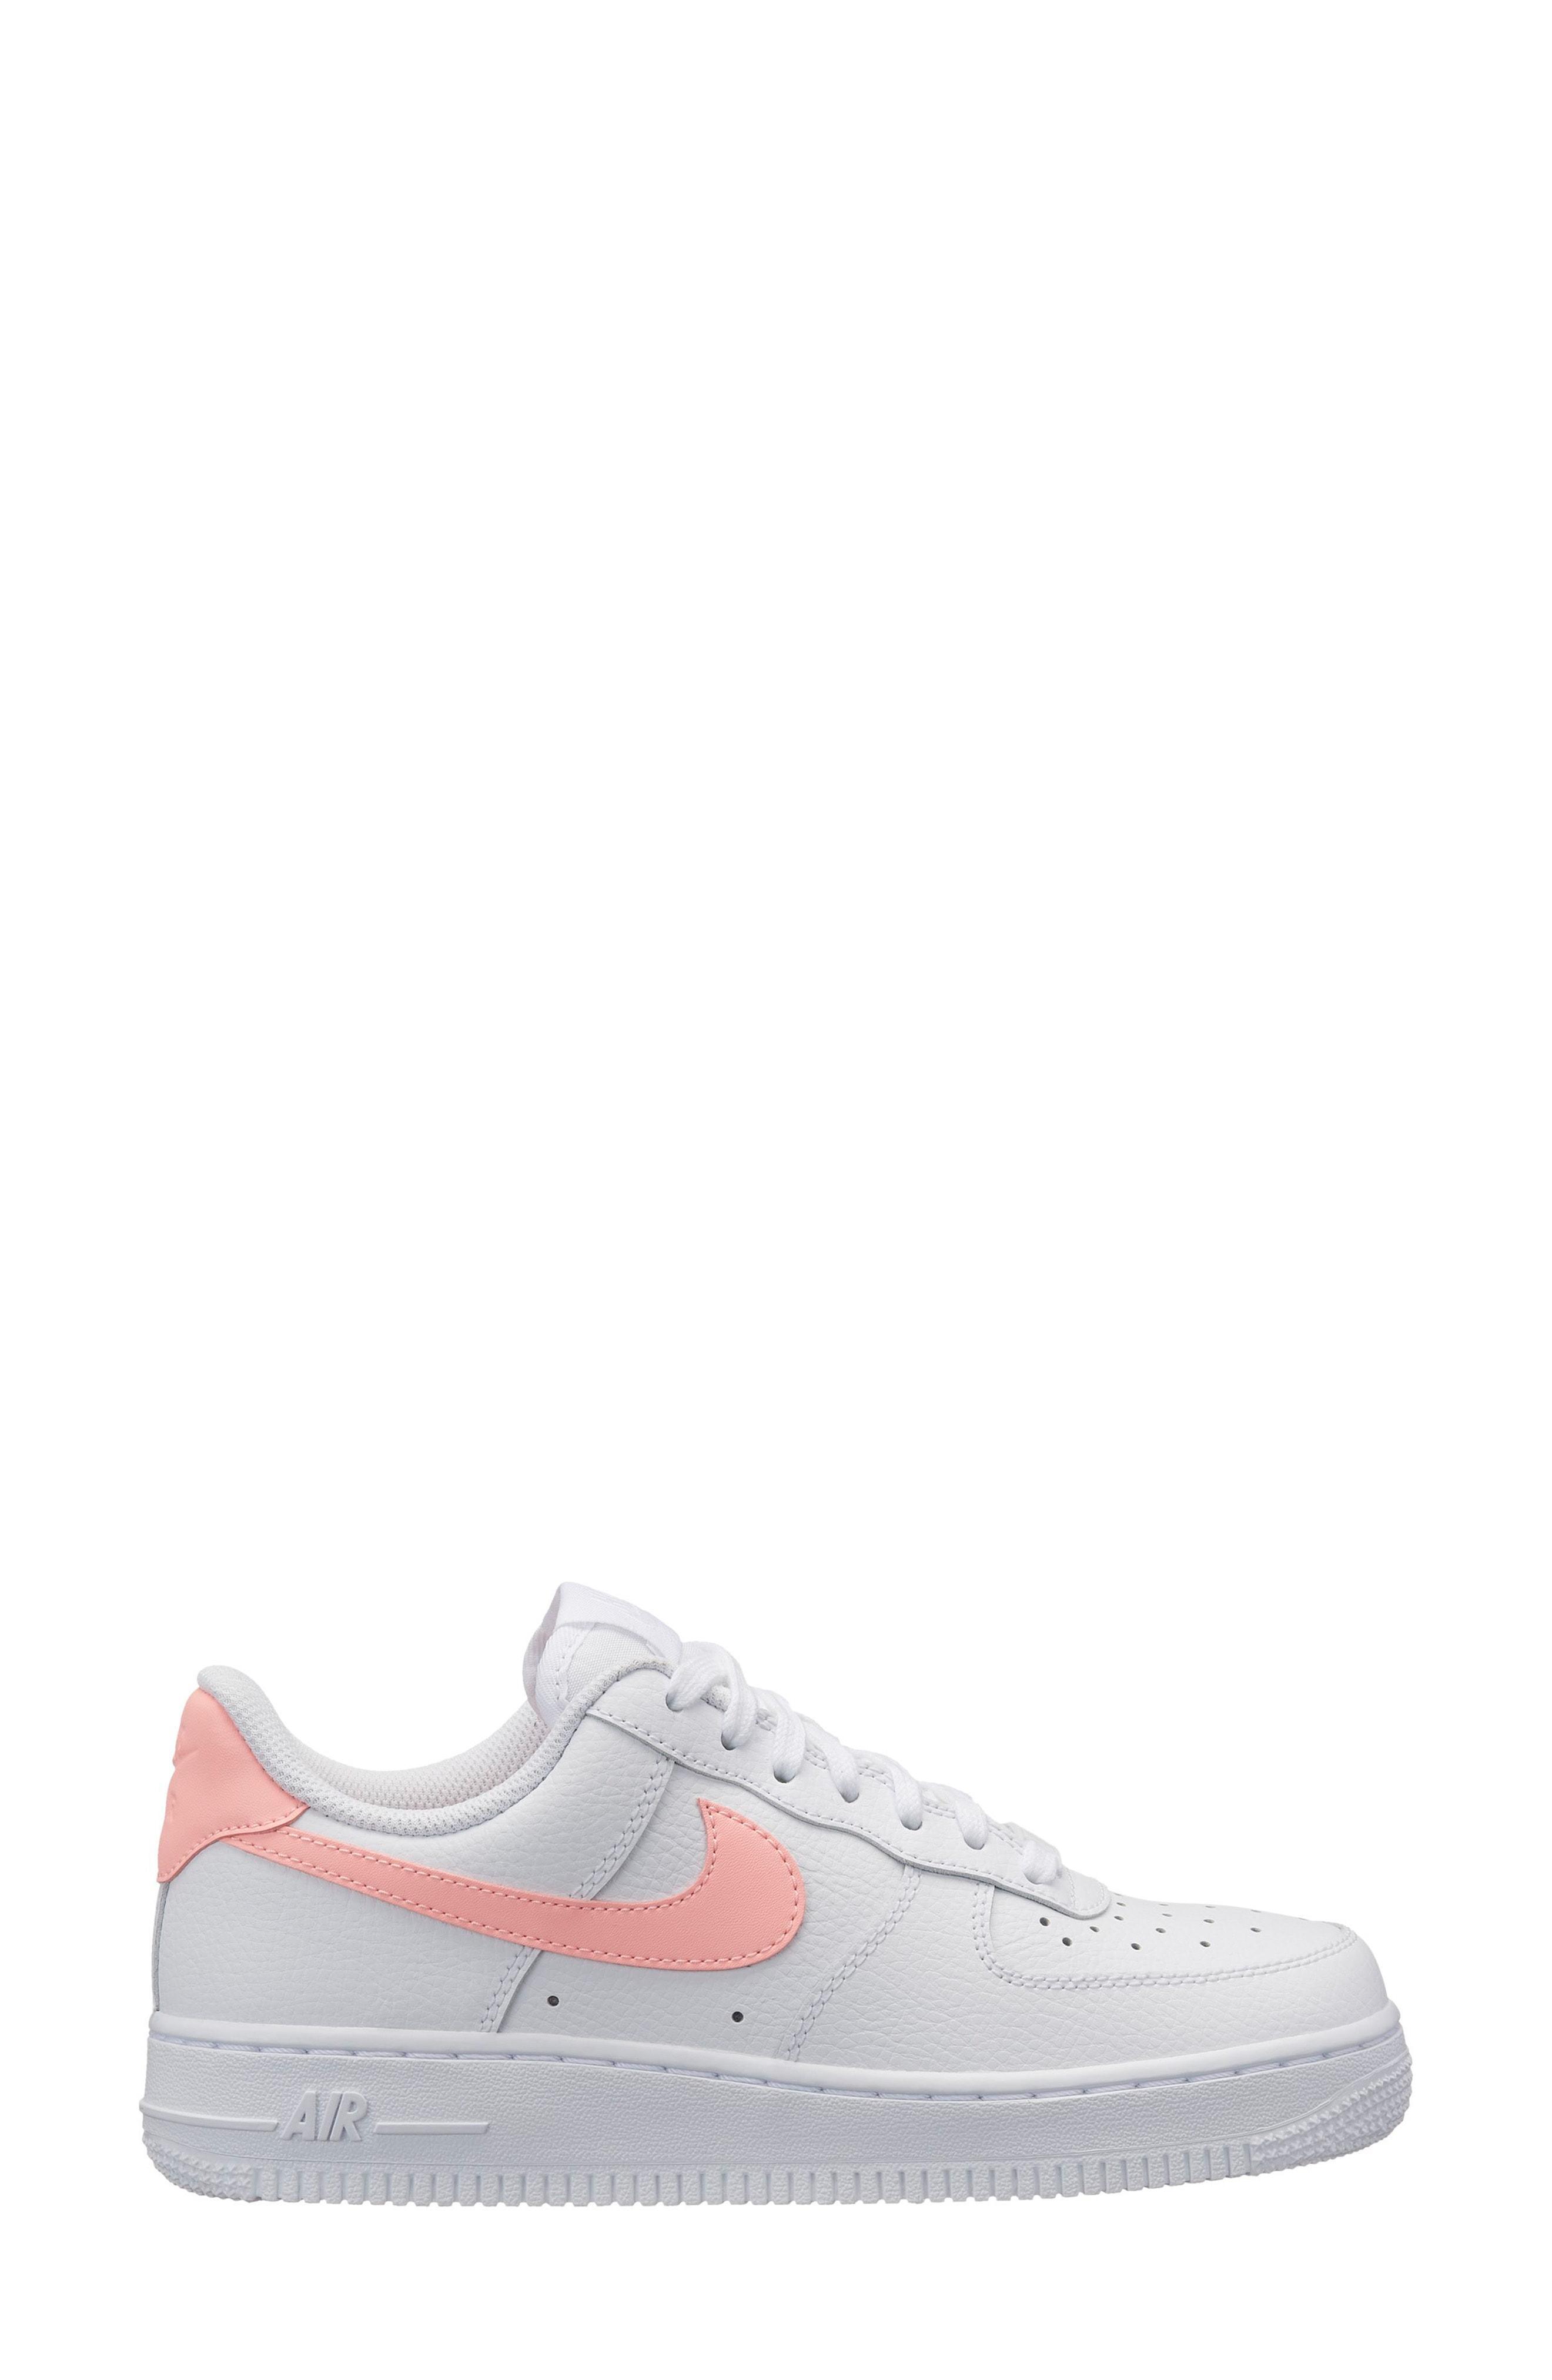 Nike Air Force 1 '07 Sneaker (Women)